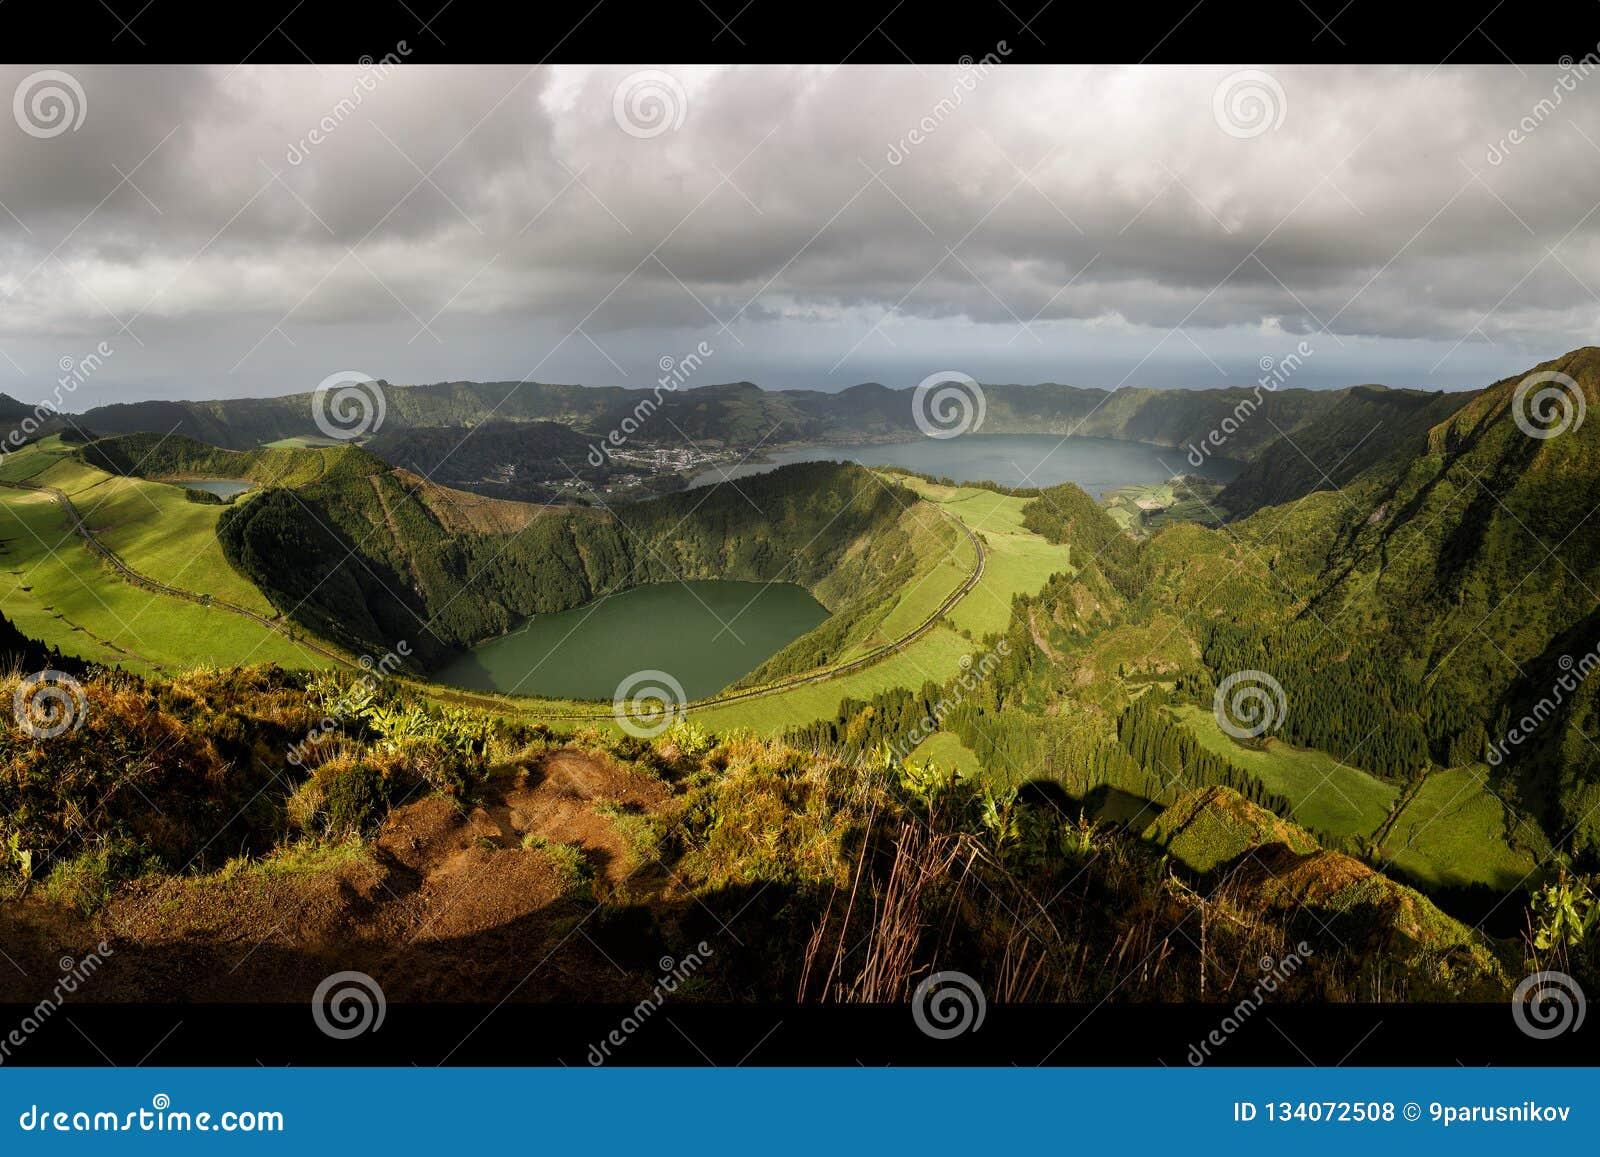 View from Miradouro da Boca do Inferno to Sete Citades, Azores